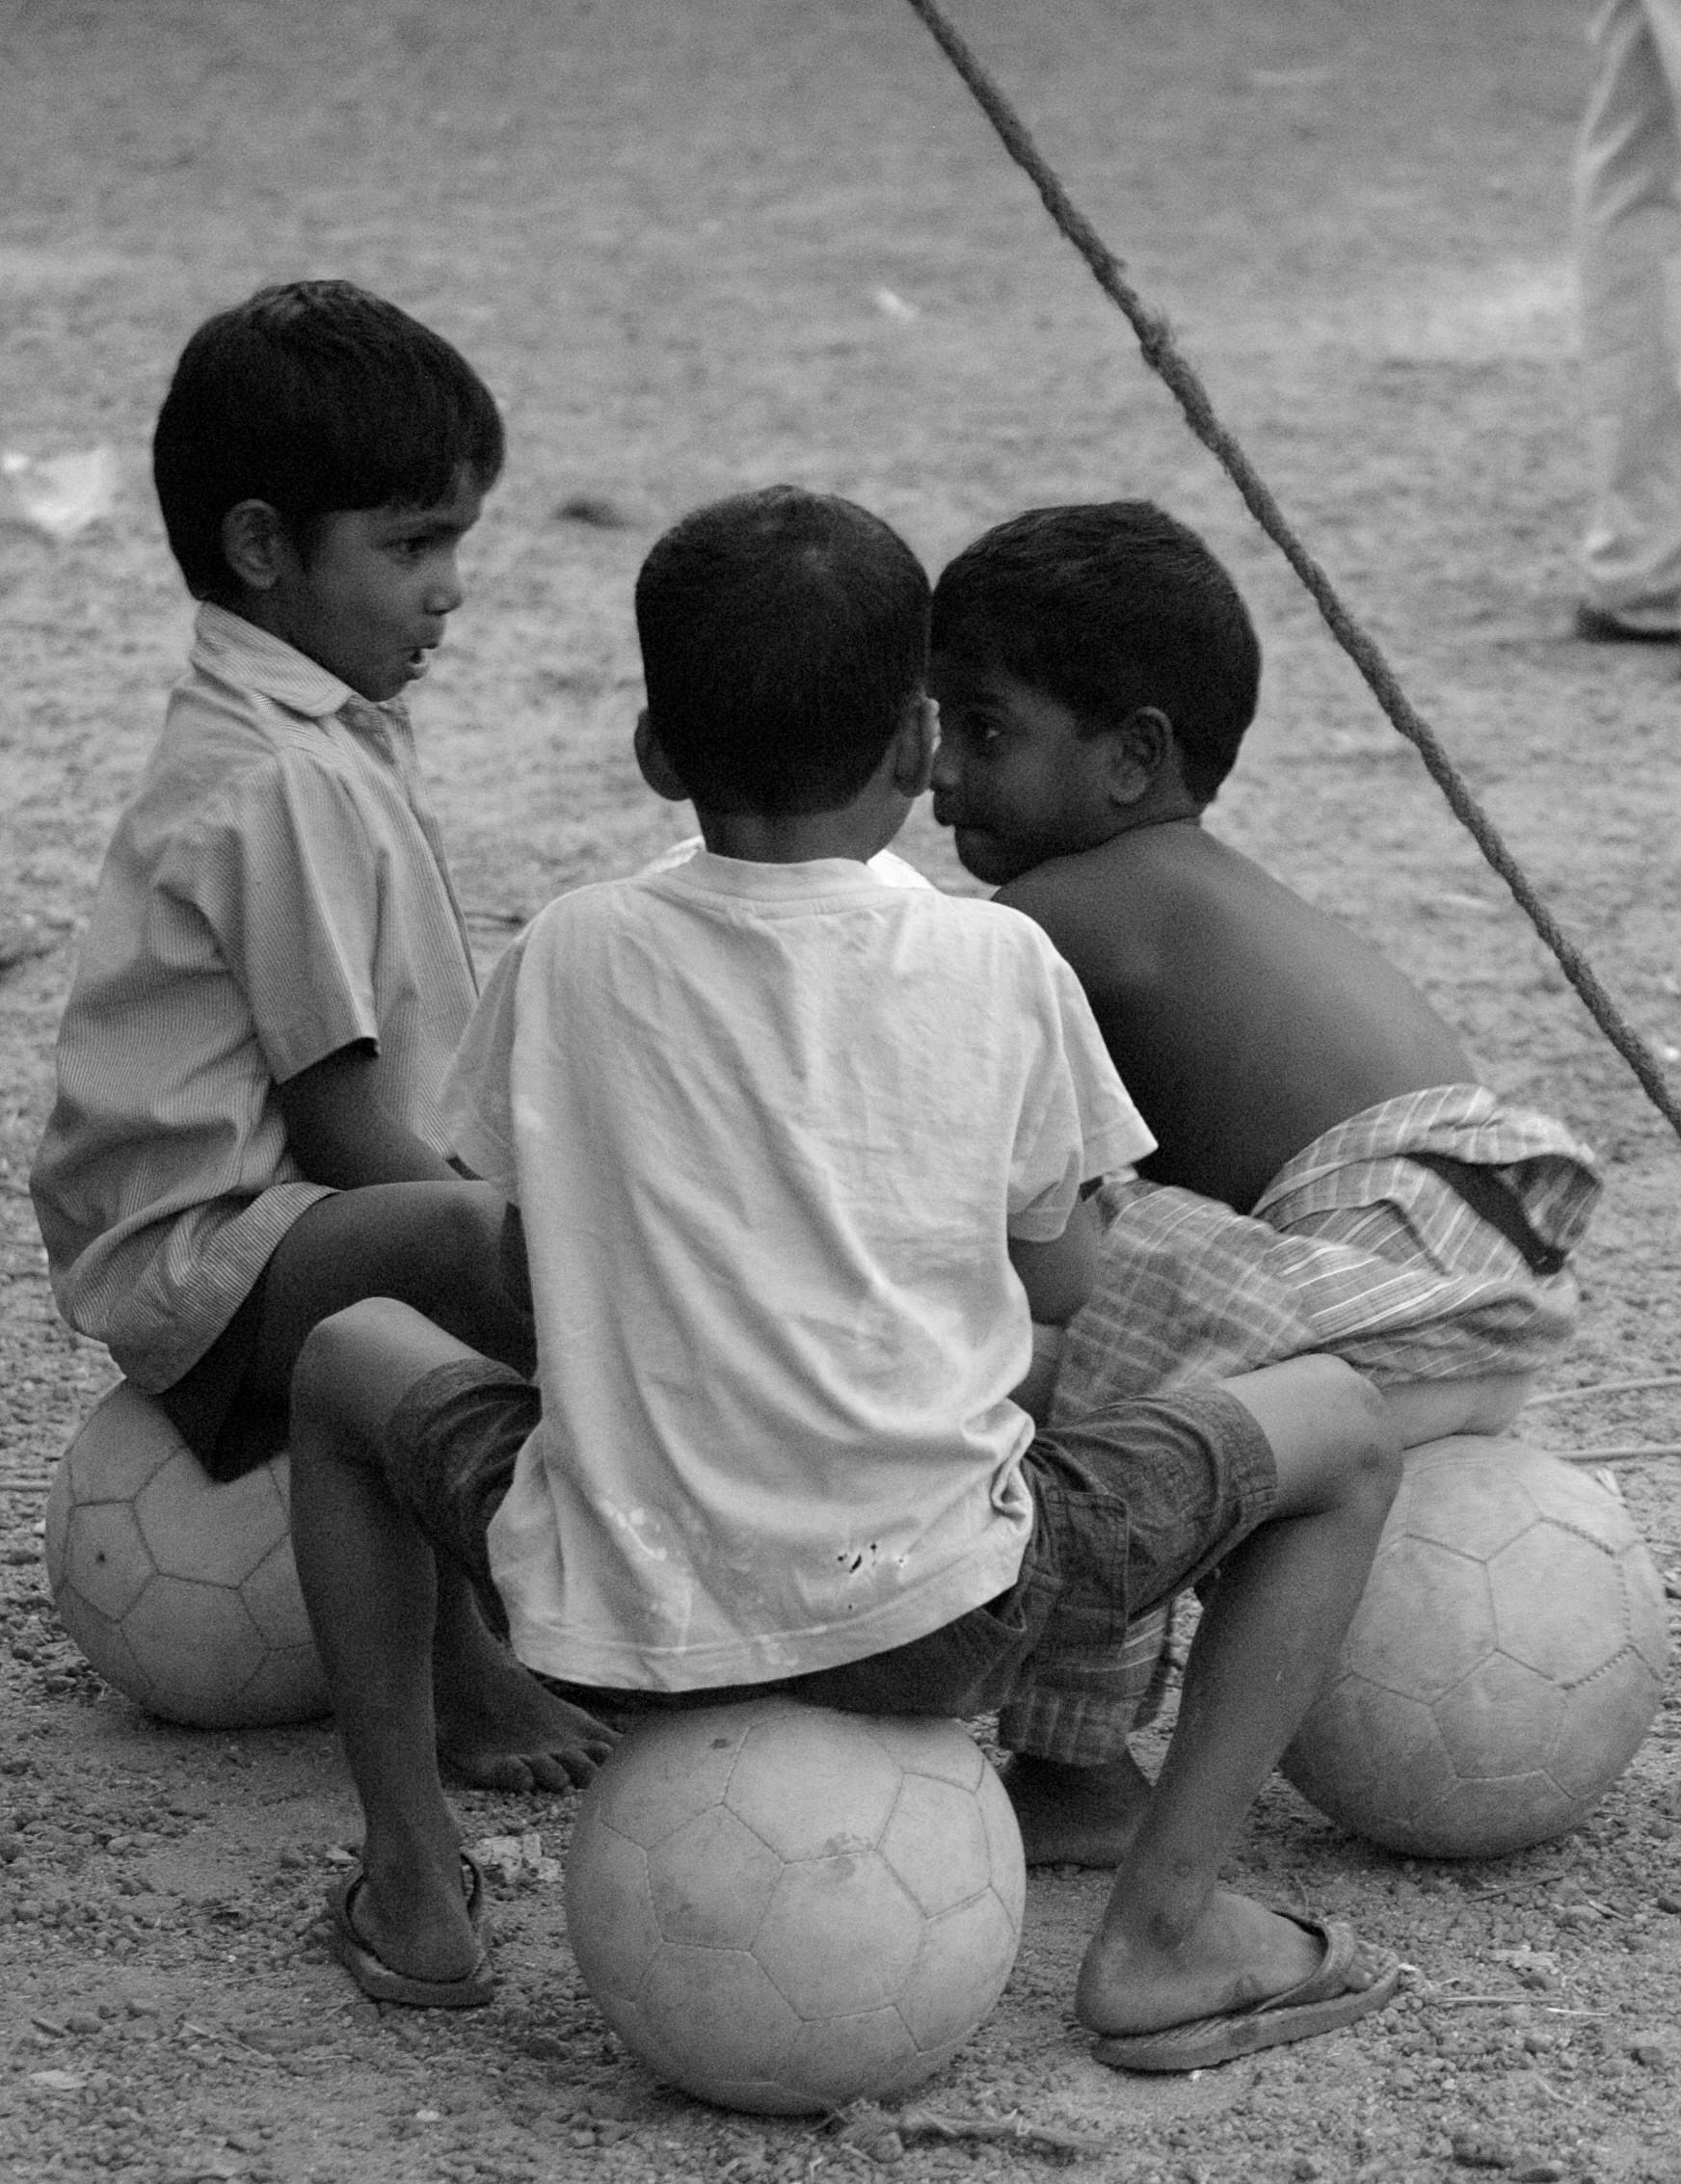 Balls & Kids